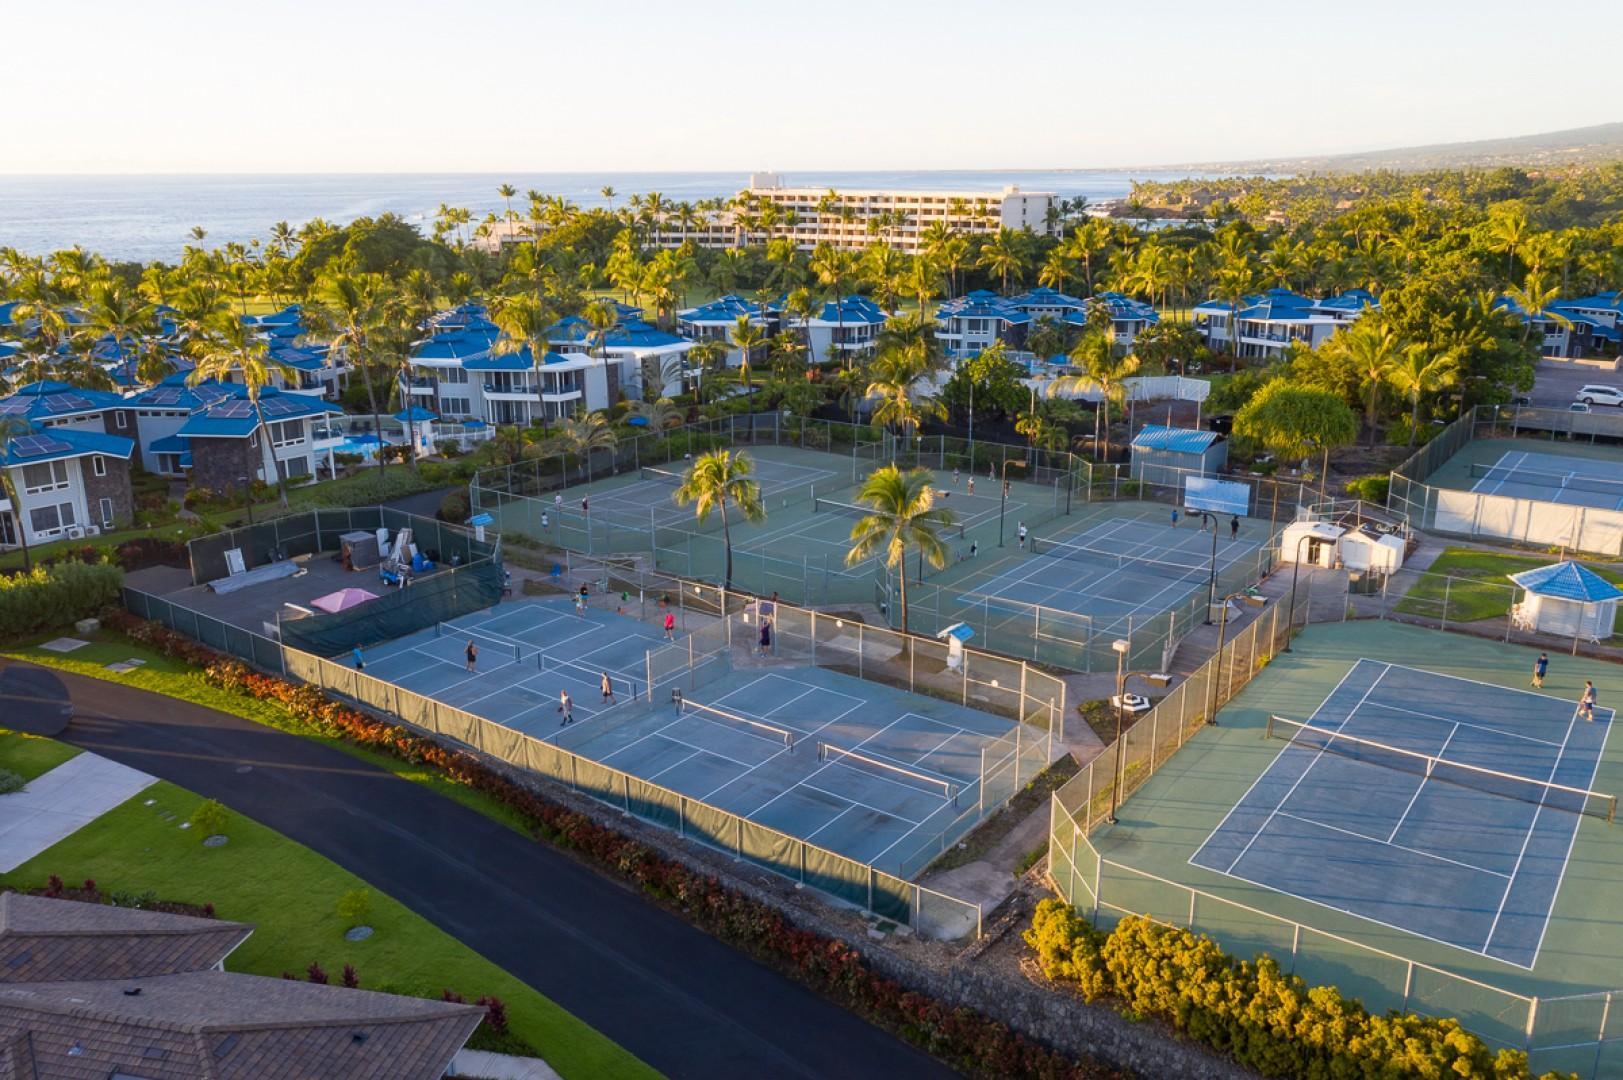 Holua Tennis and Pickel Ball Center